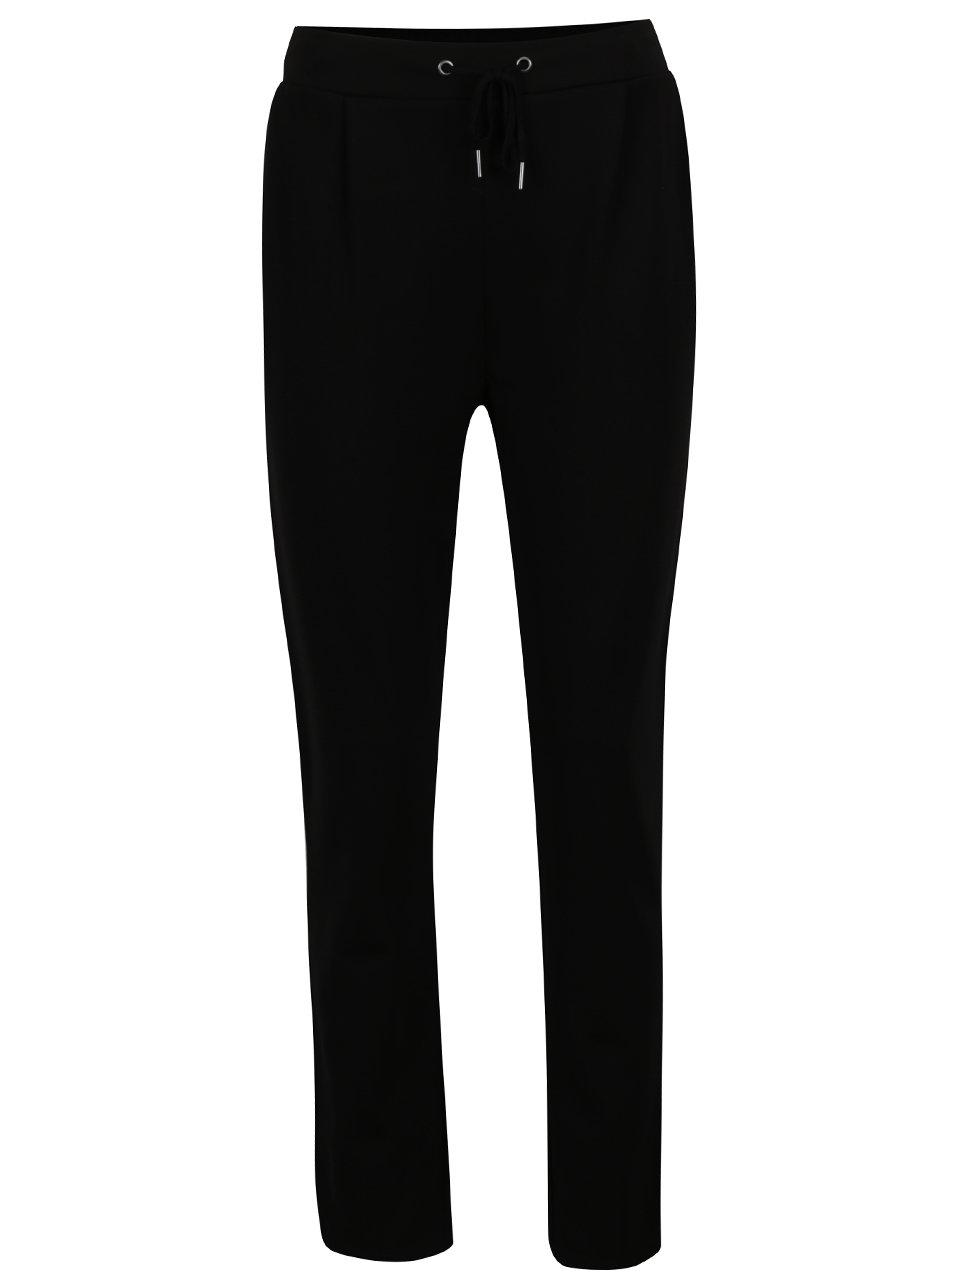 Černé volné kalhoty s pružným pasem VILA Class 3bf14b13ae